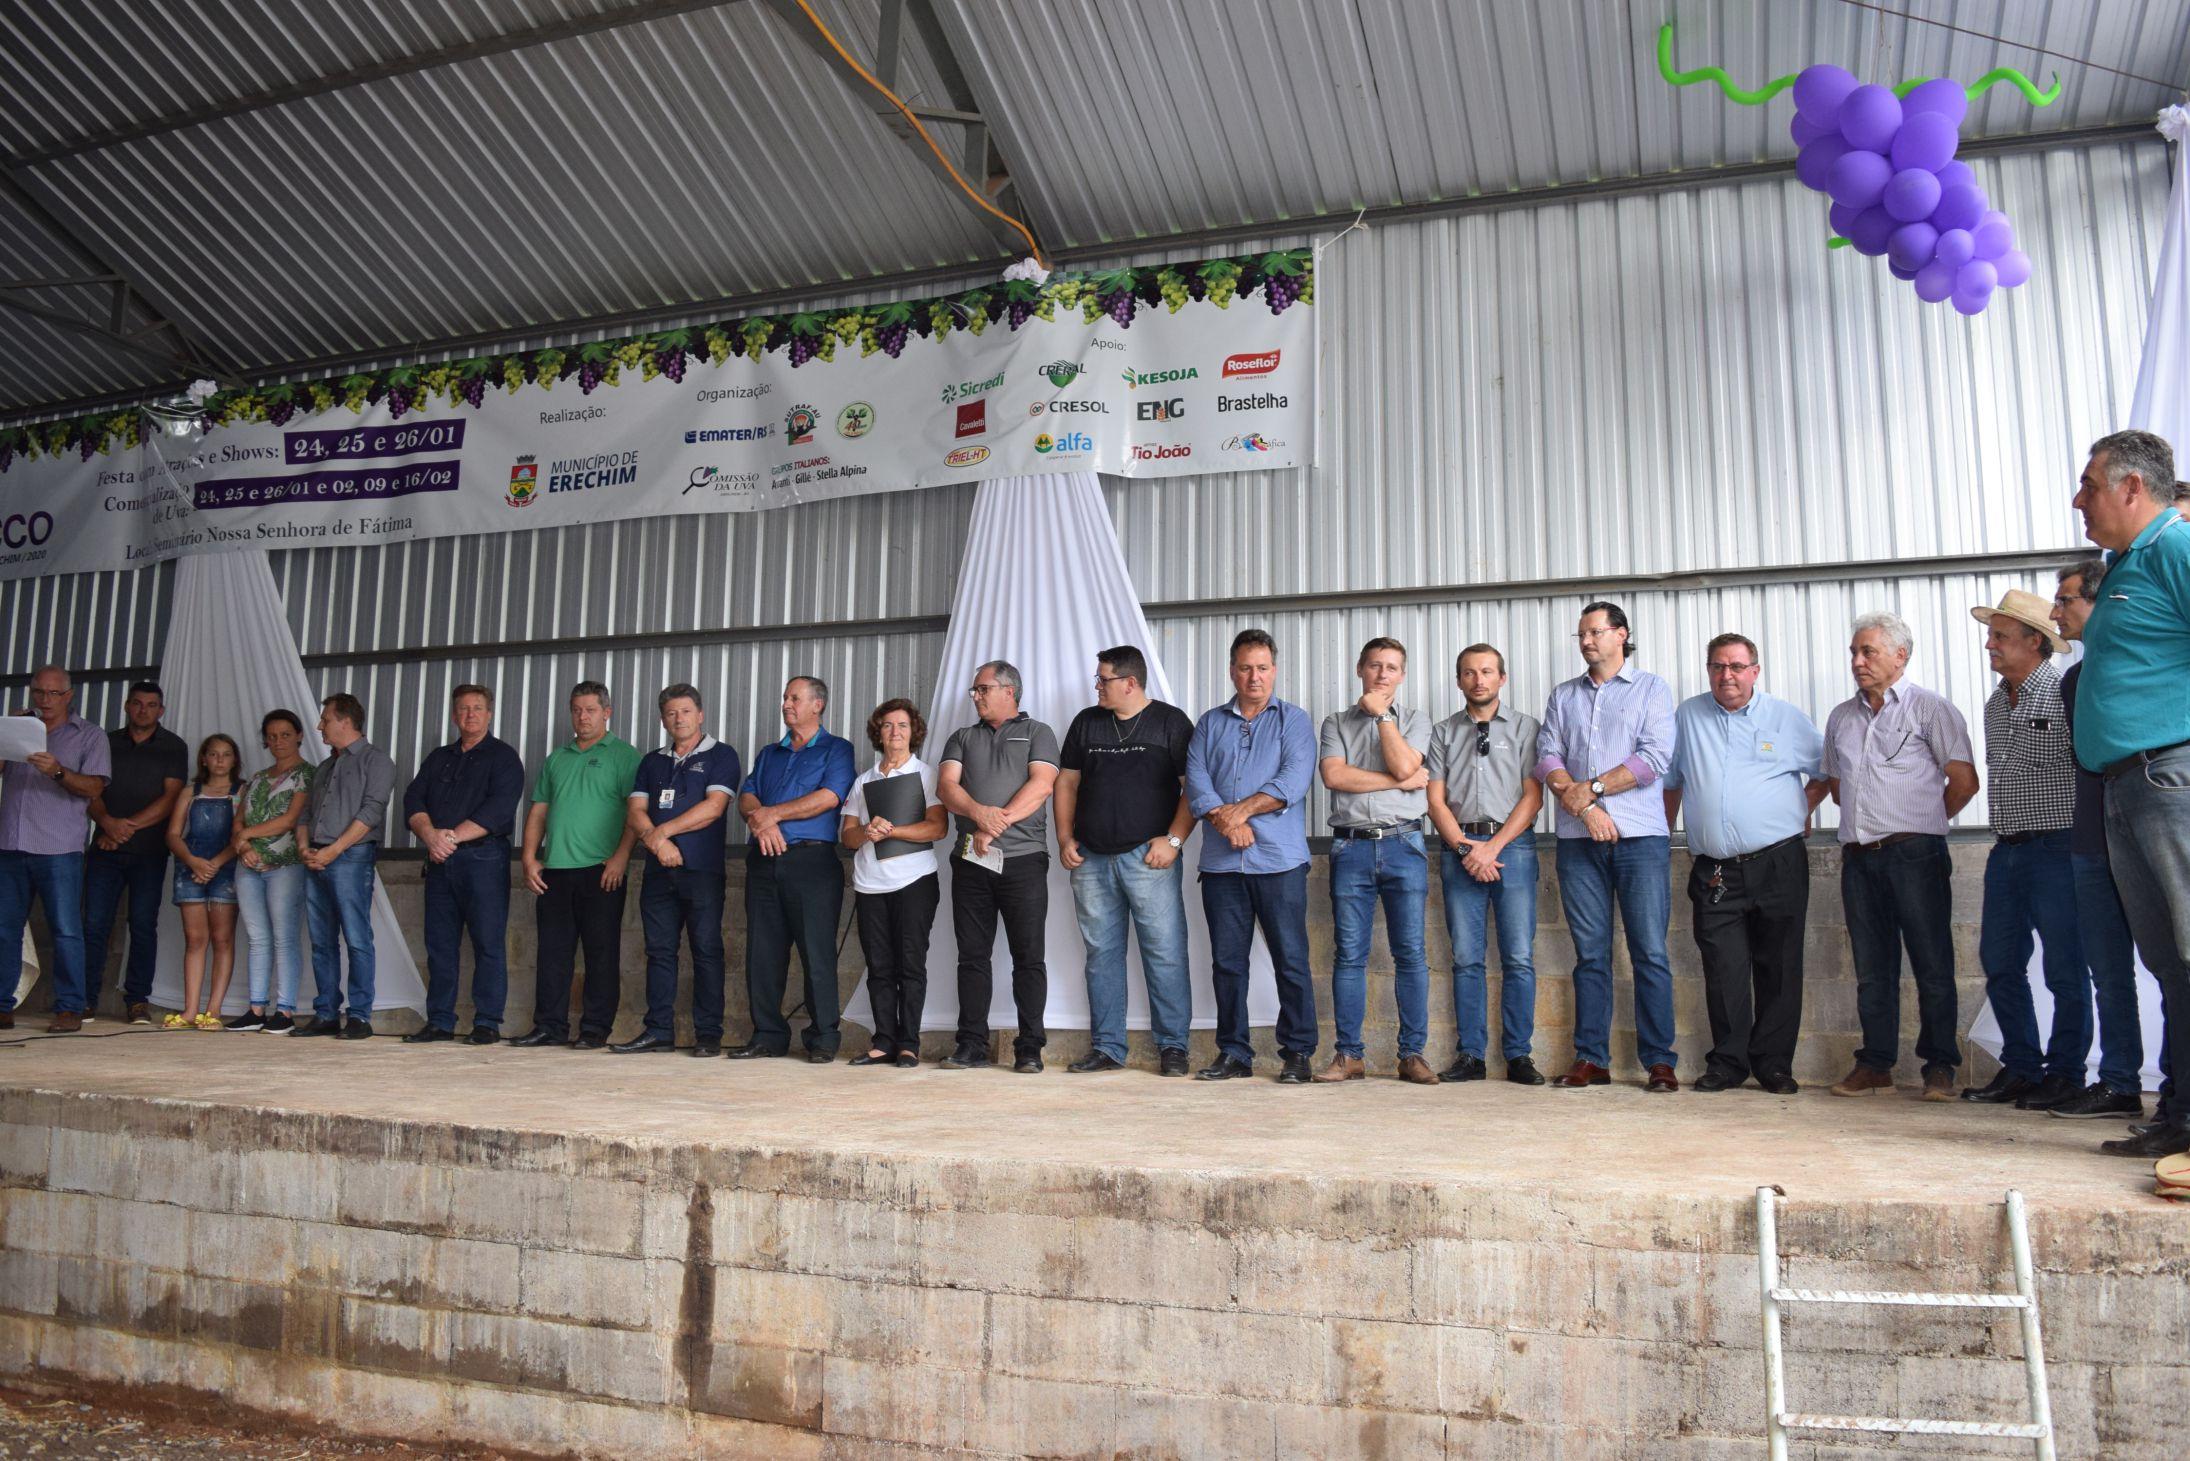 Vice-presidente da Creral participou da abertura da Safra da Uva